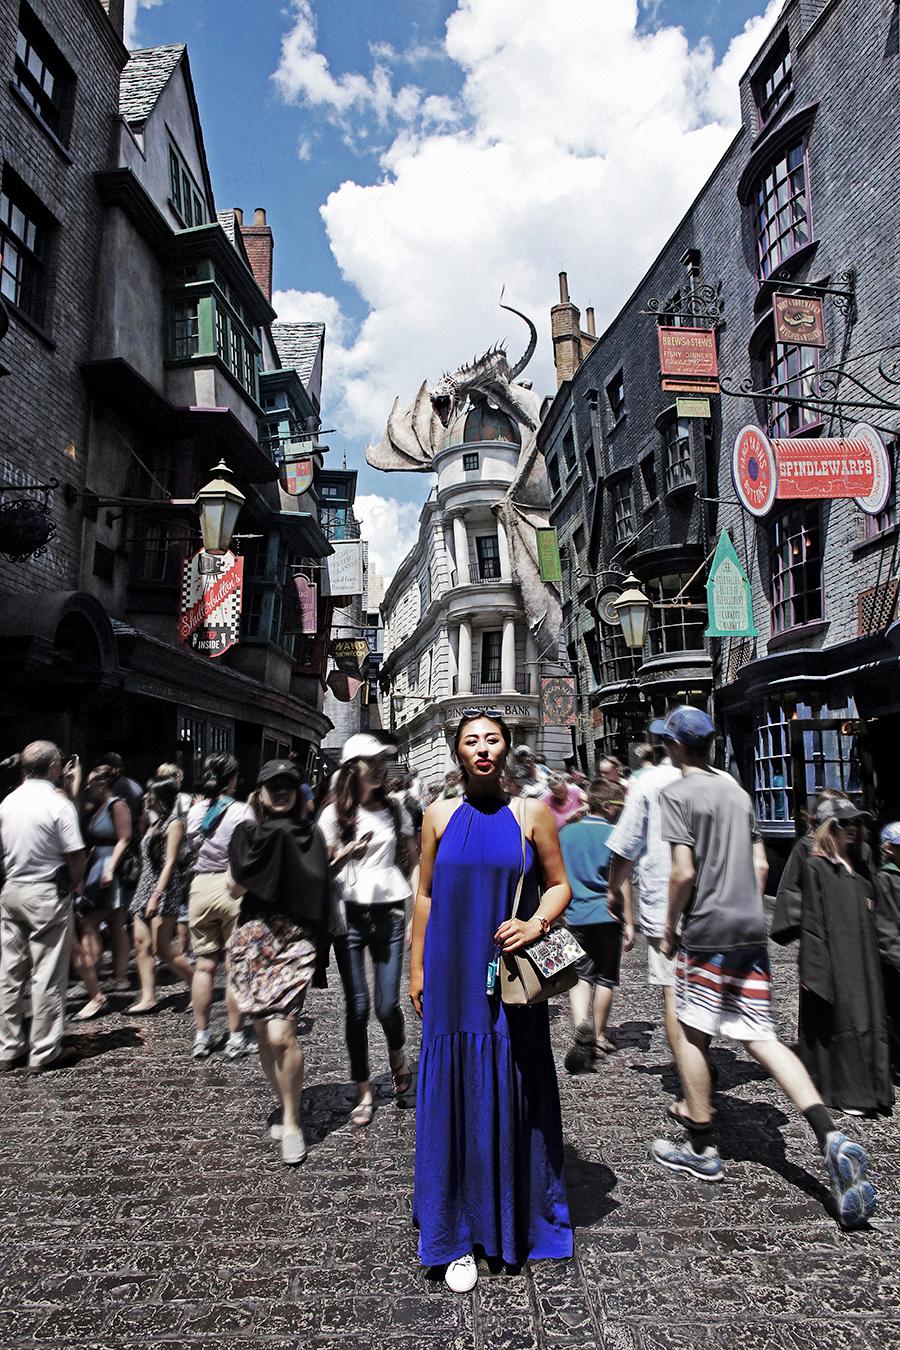 Orlando, Florida: Universal Studios Florida